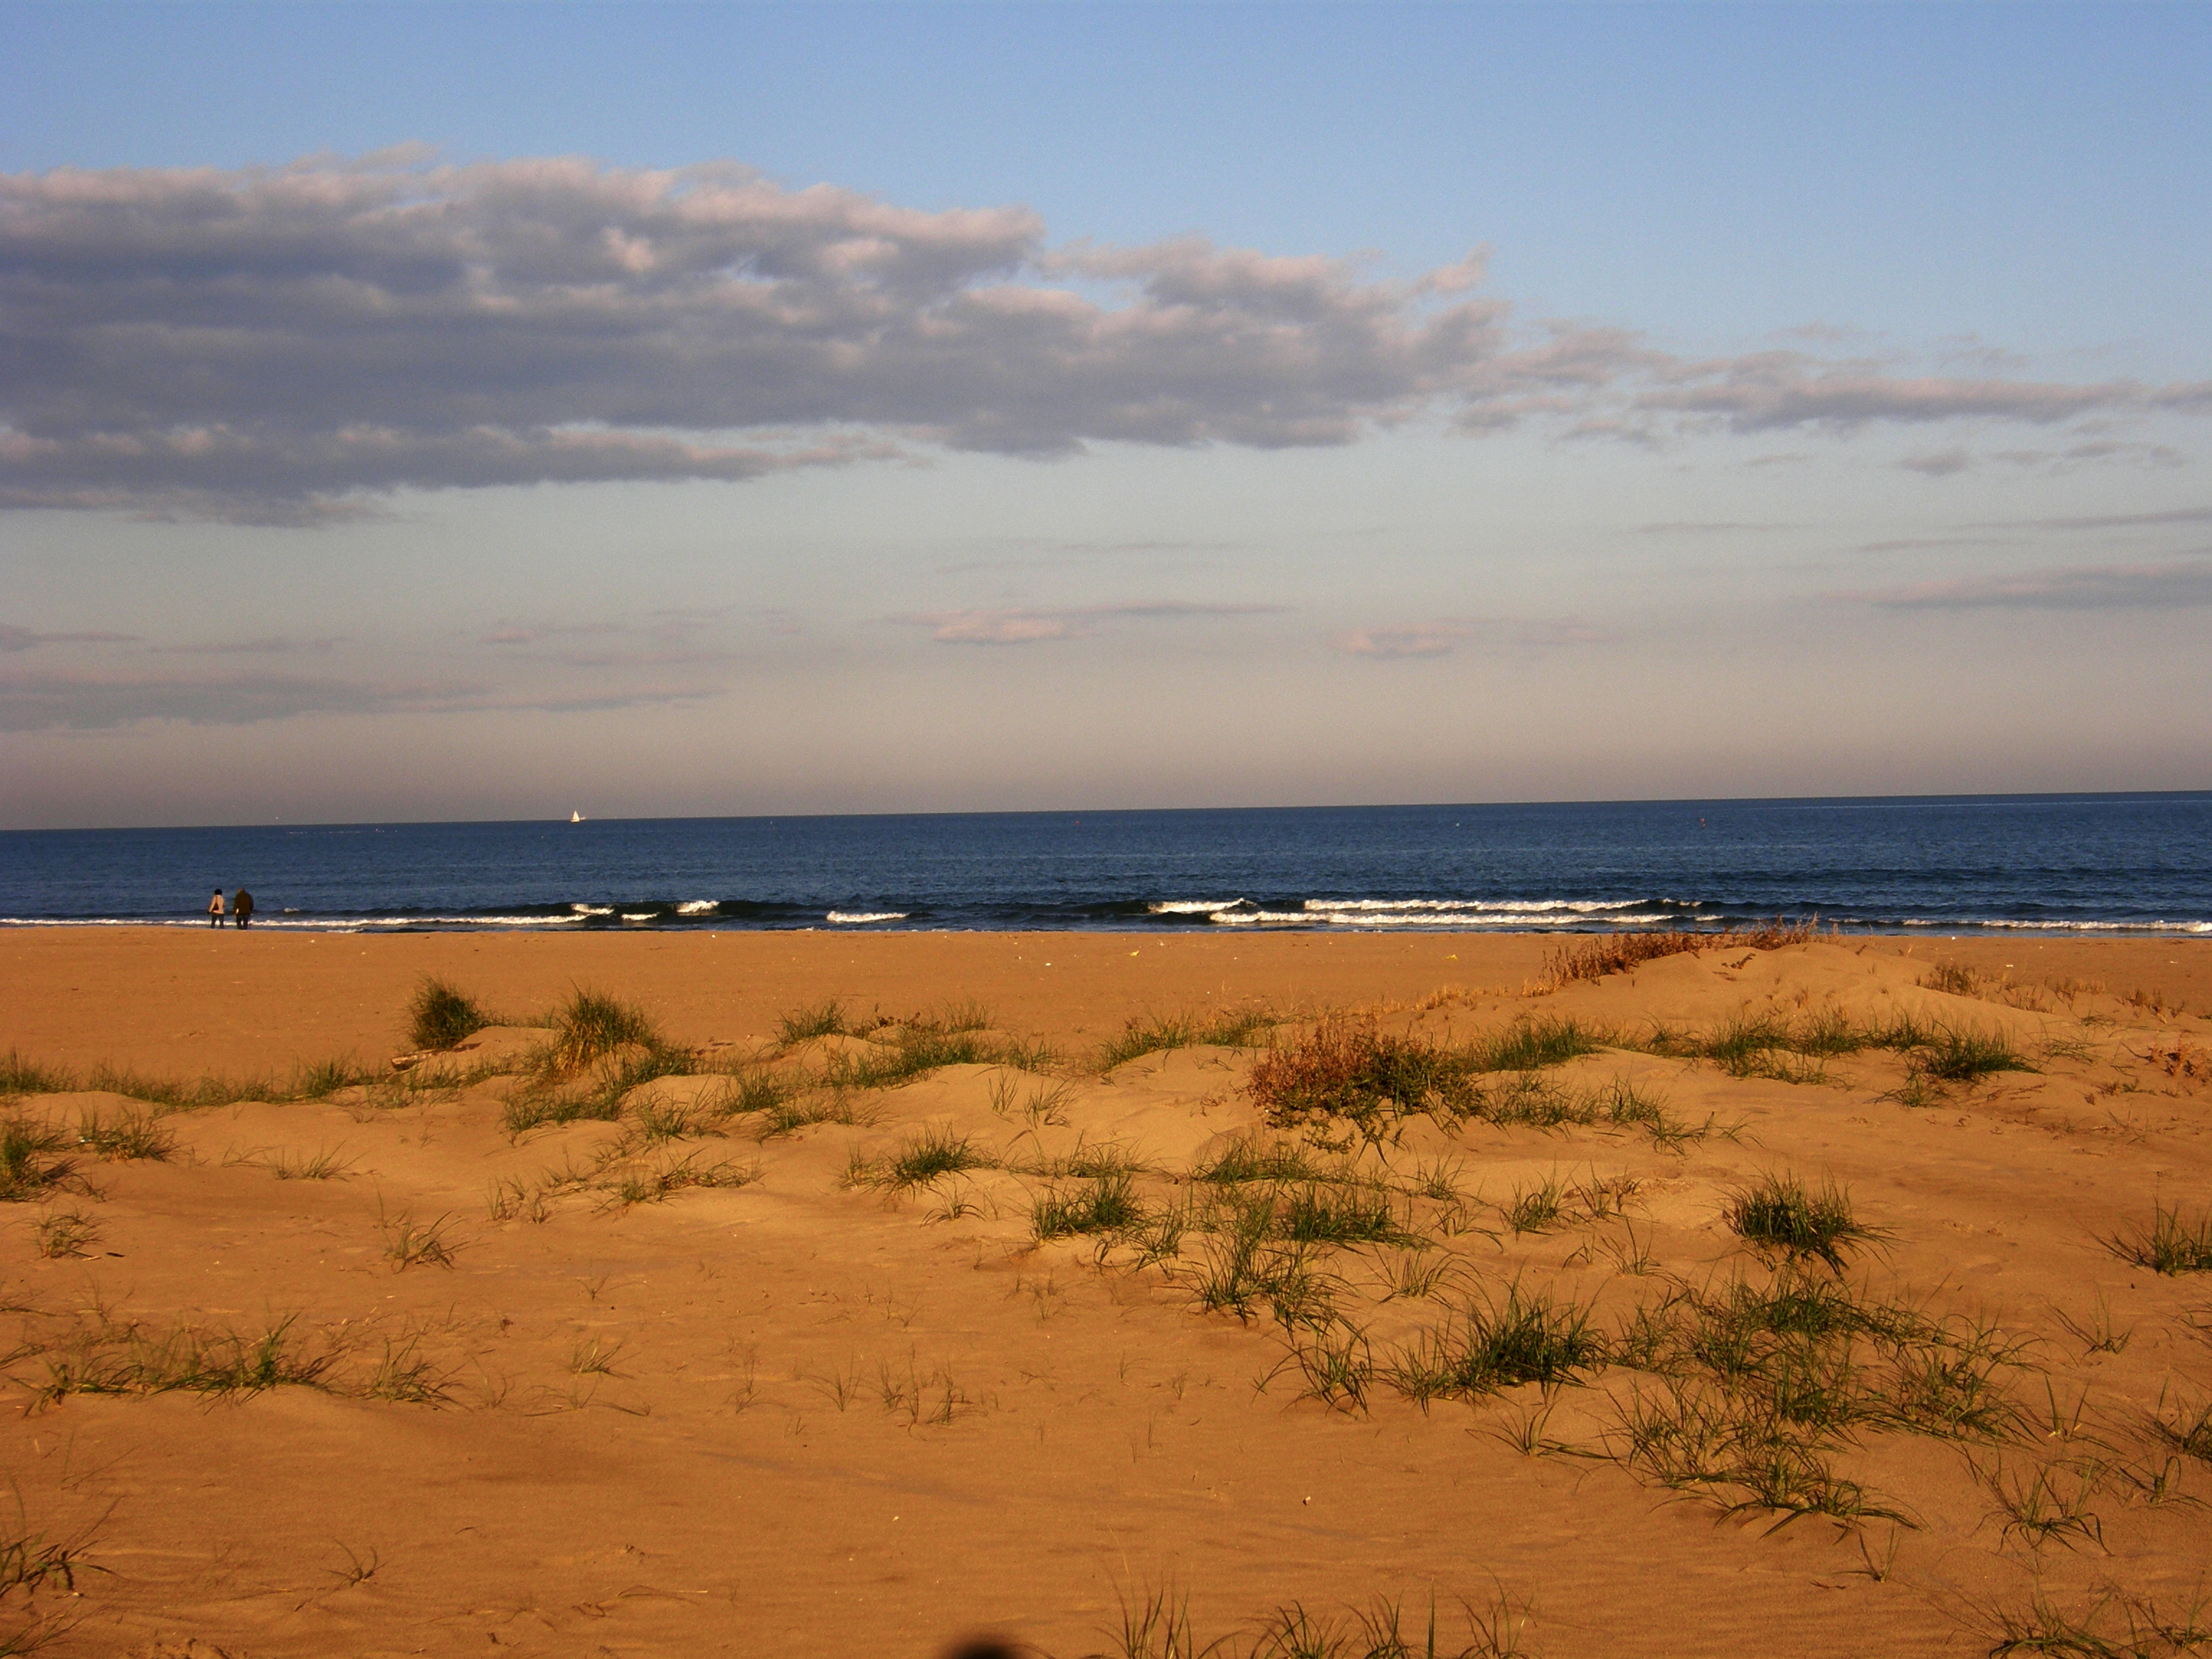 Playa Patacona